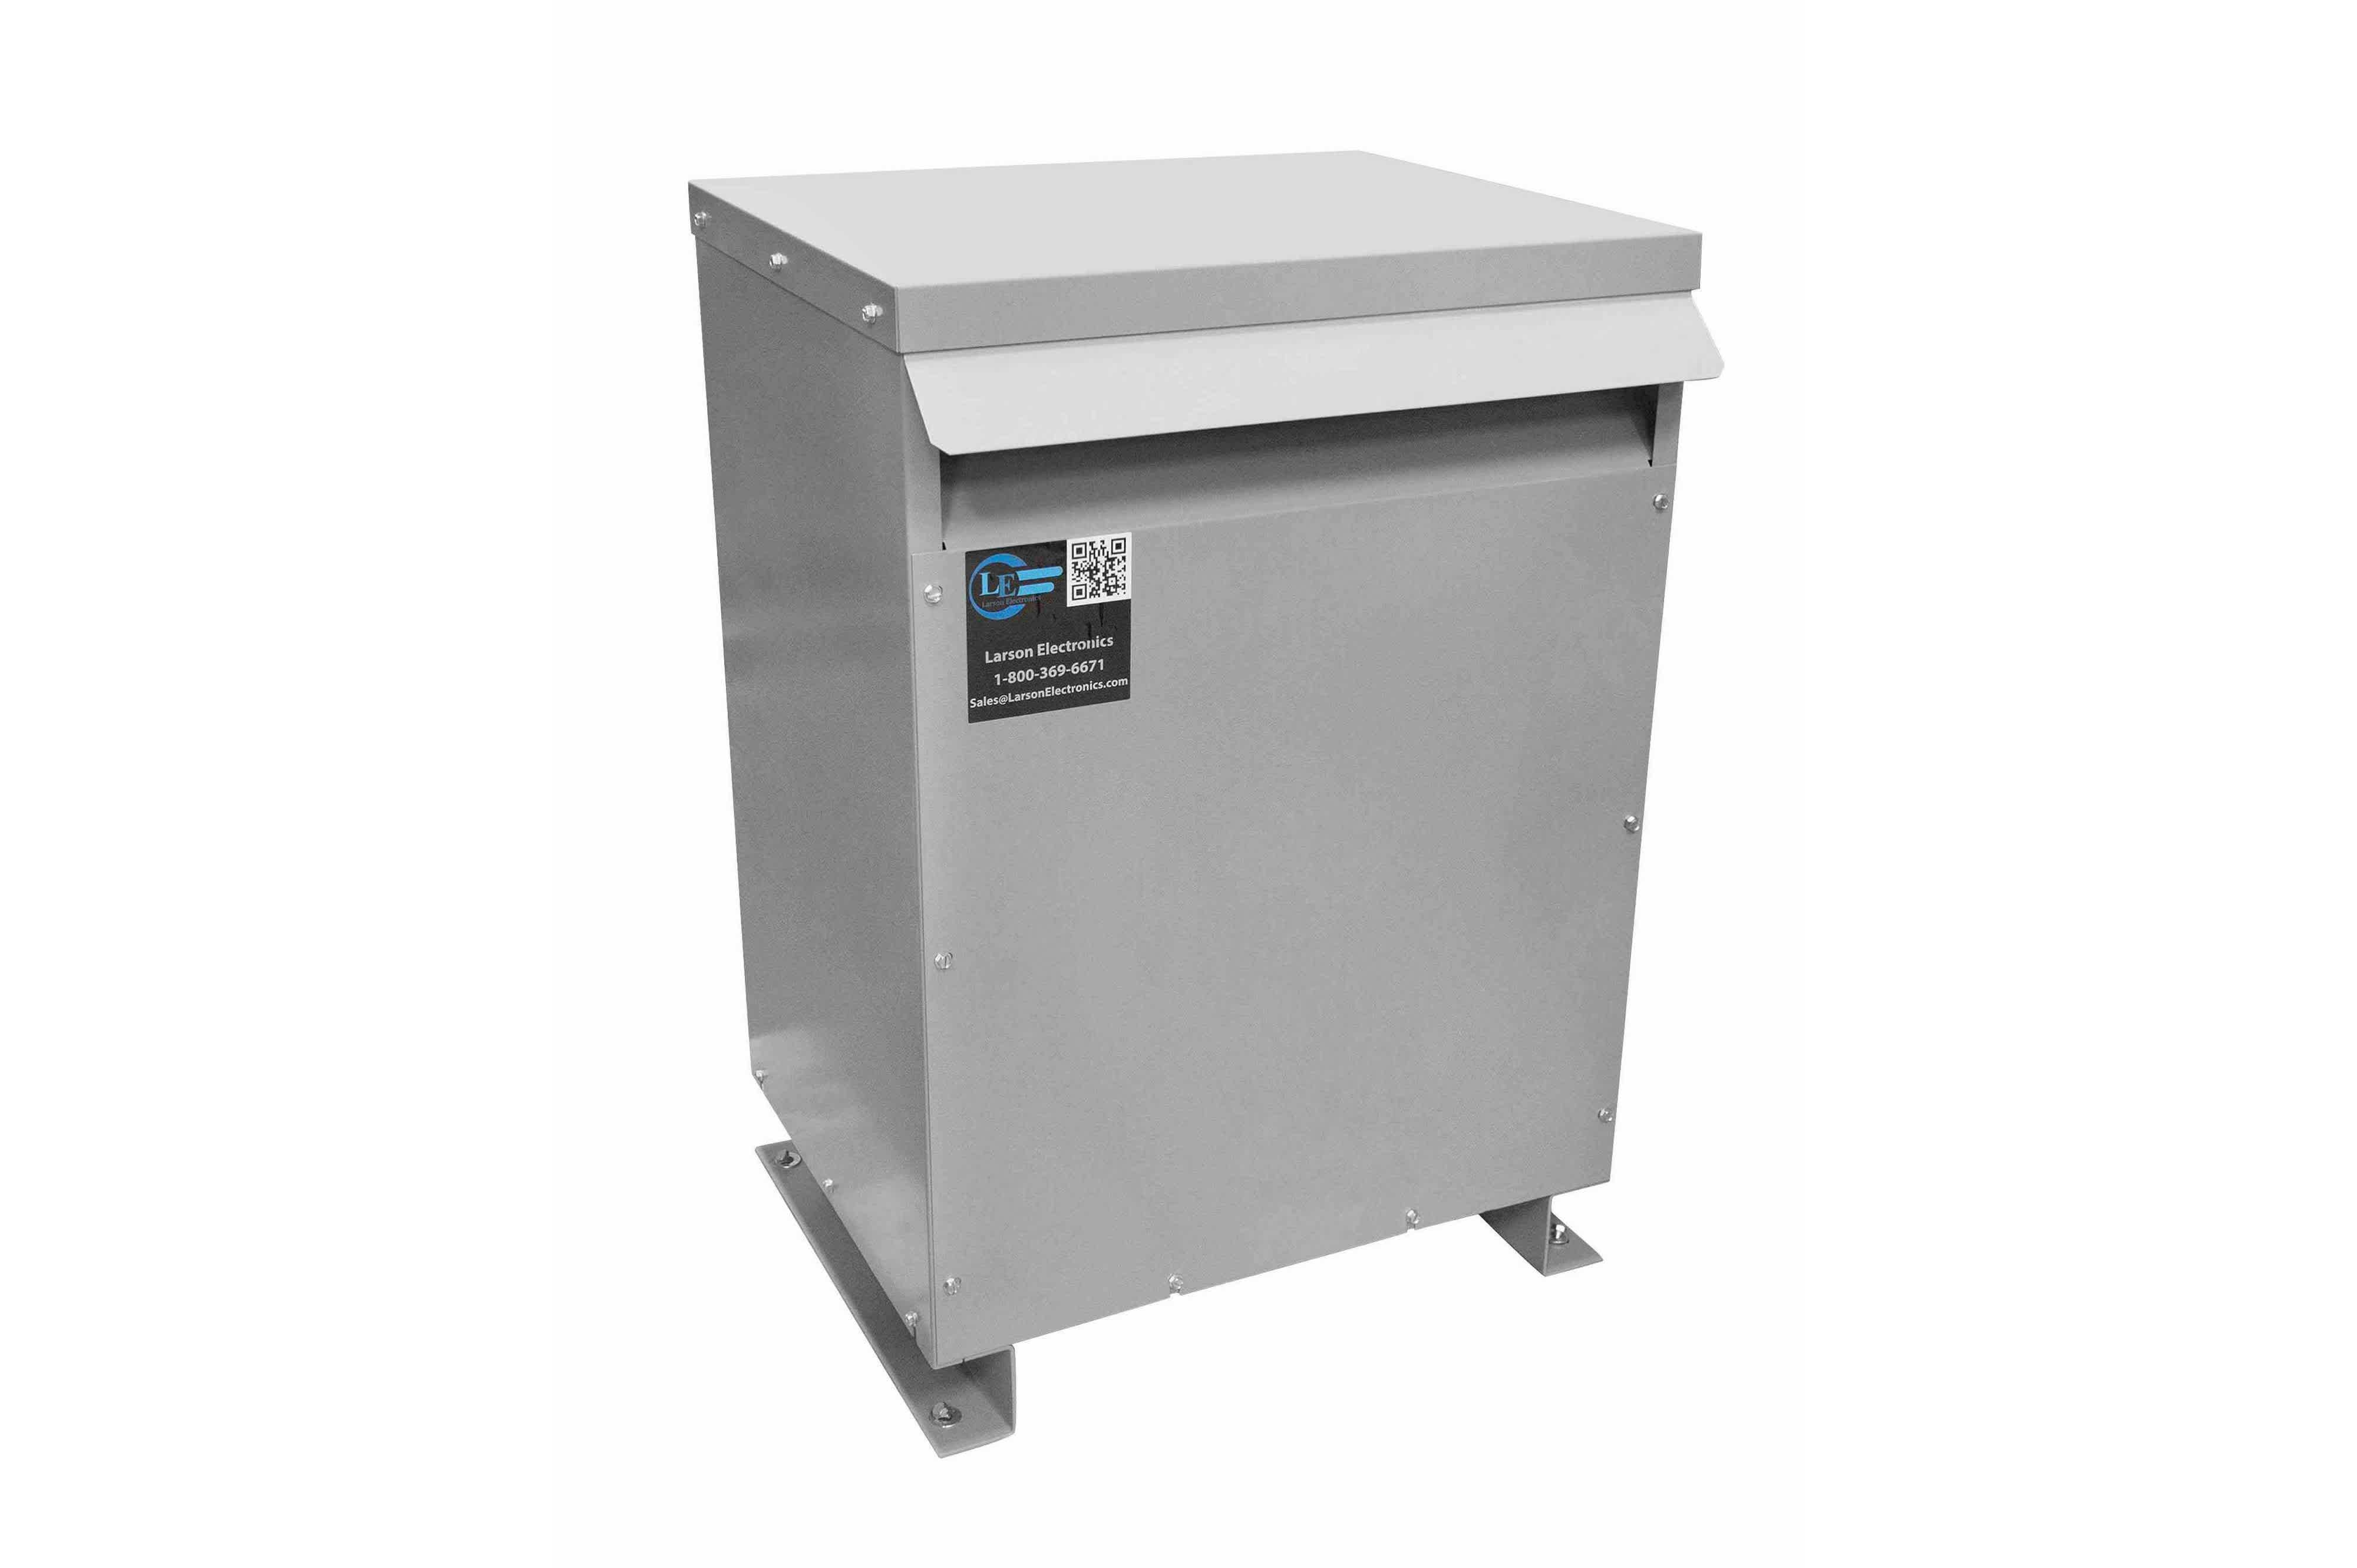 47.5 kVA 3PH Isolation Transformer, 400V Wye Primary, 208V Delta Secondary, N3R, Ventilated, 60 Hz